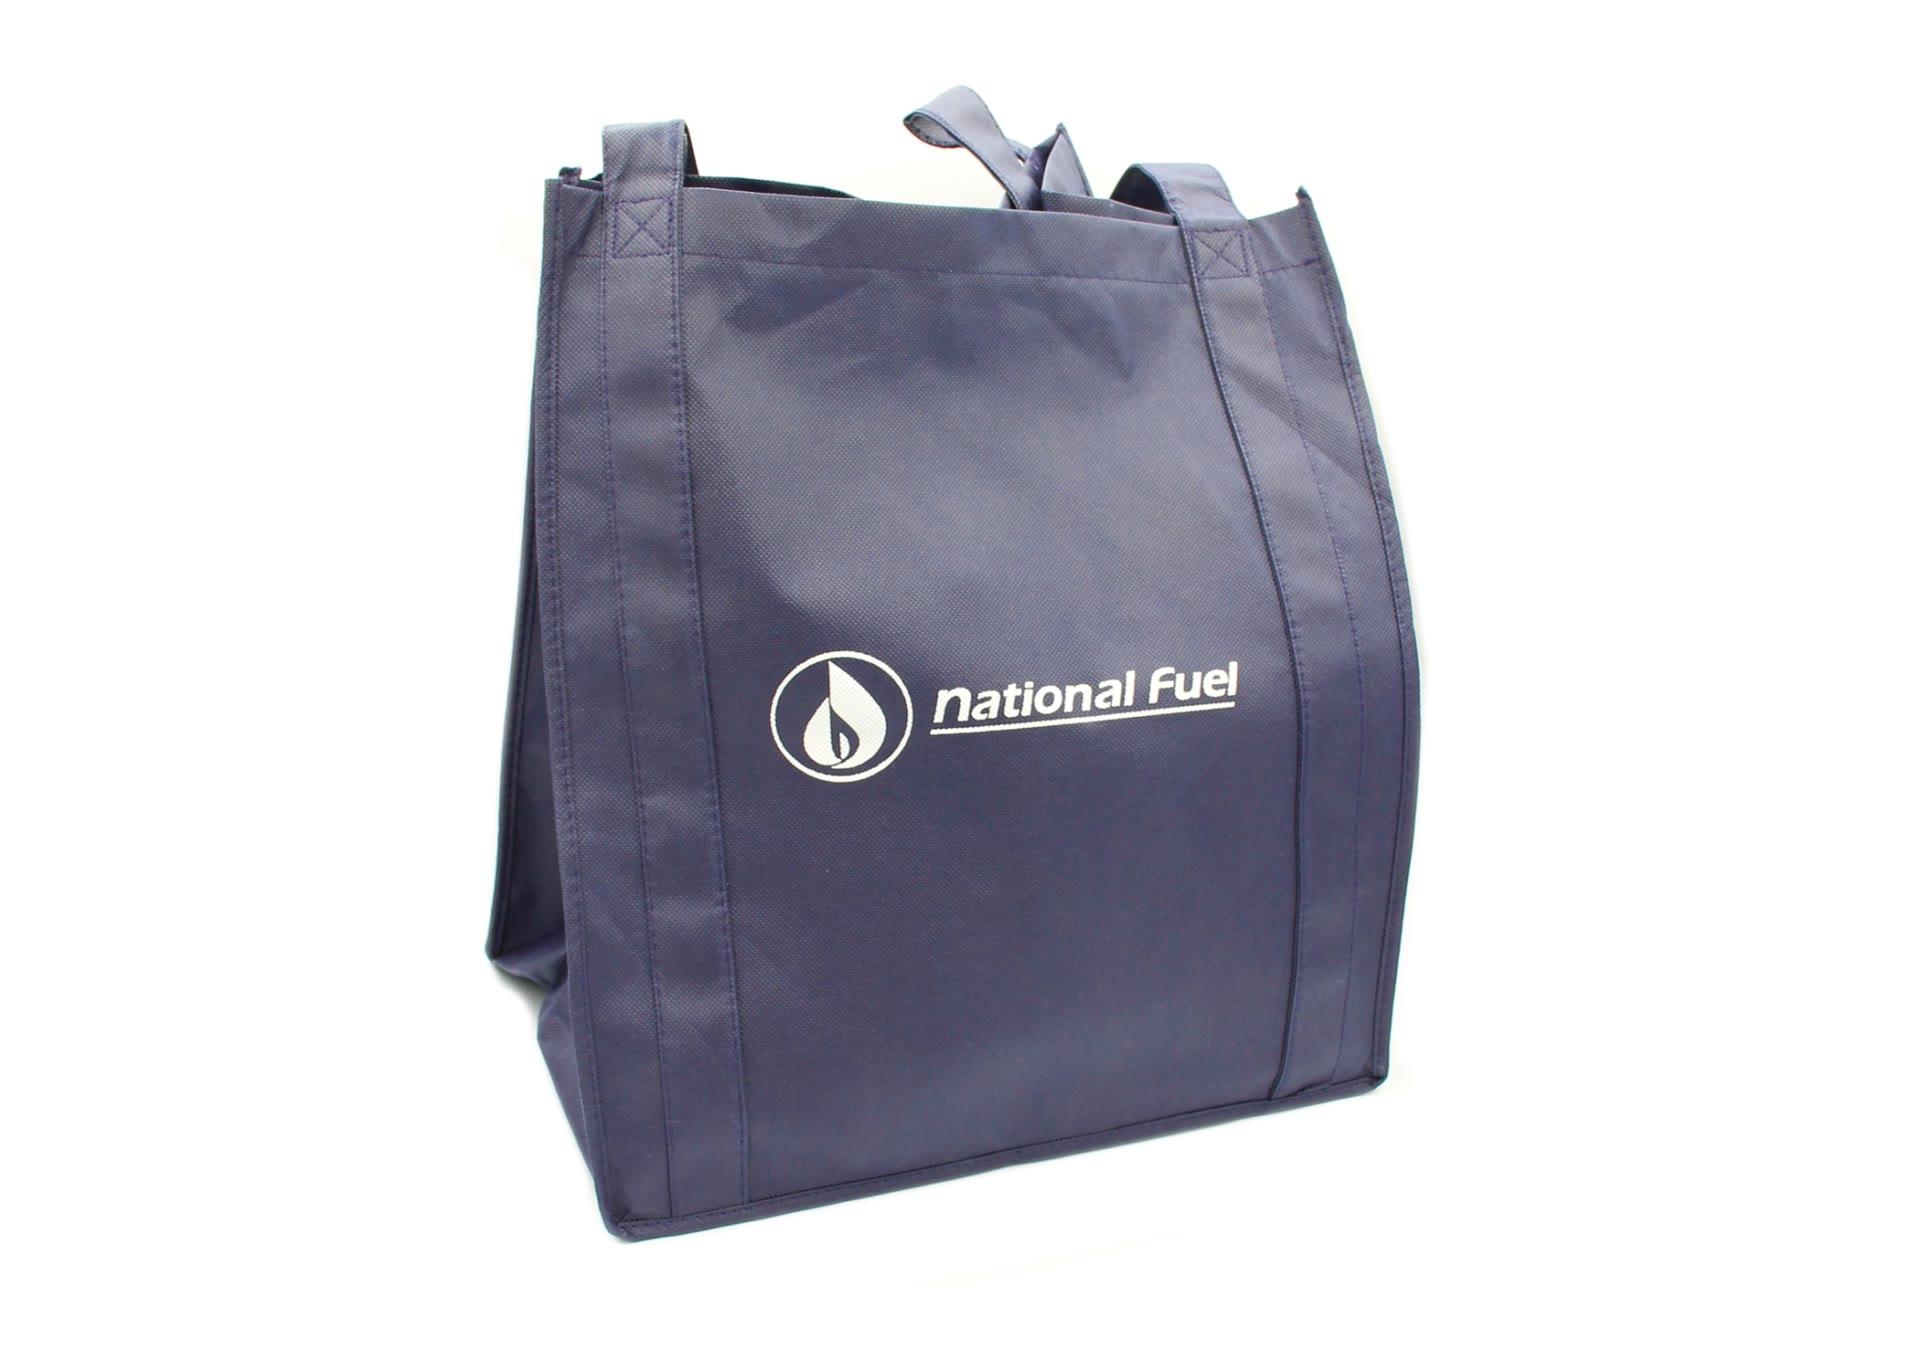 National Fuel cloth bag